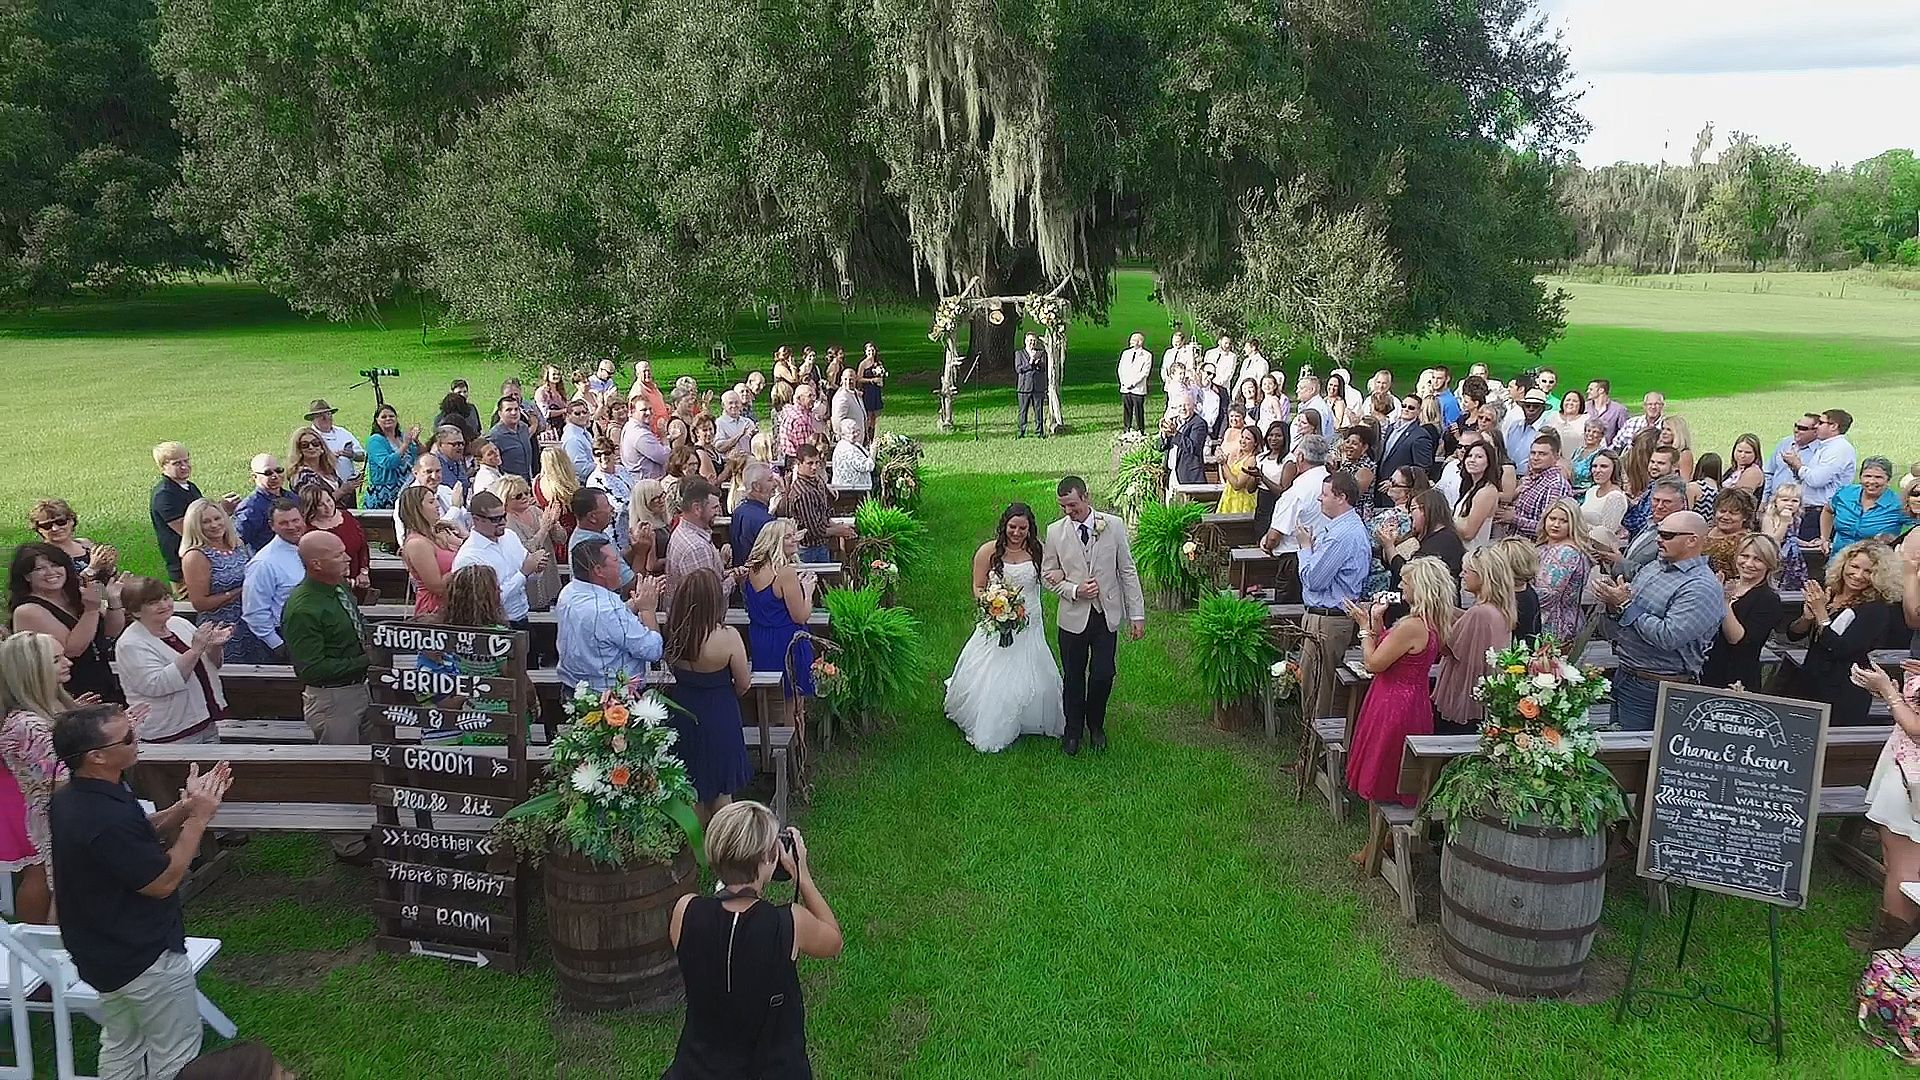 Shot By Drone At S Bar Barn Lakeland Fl: Lakeland Fl Wedding Venue At Websimilar.org